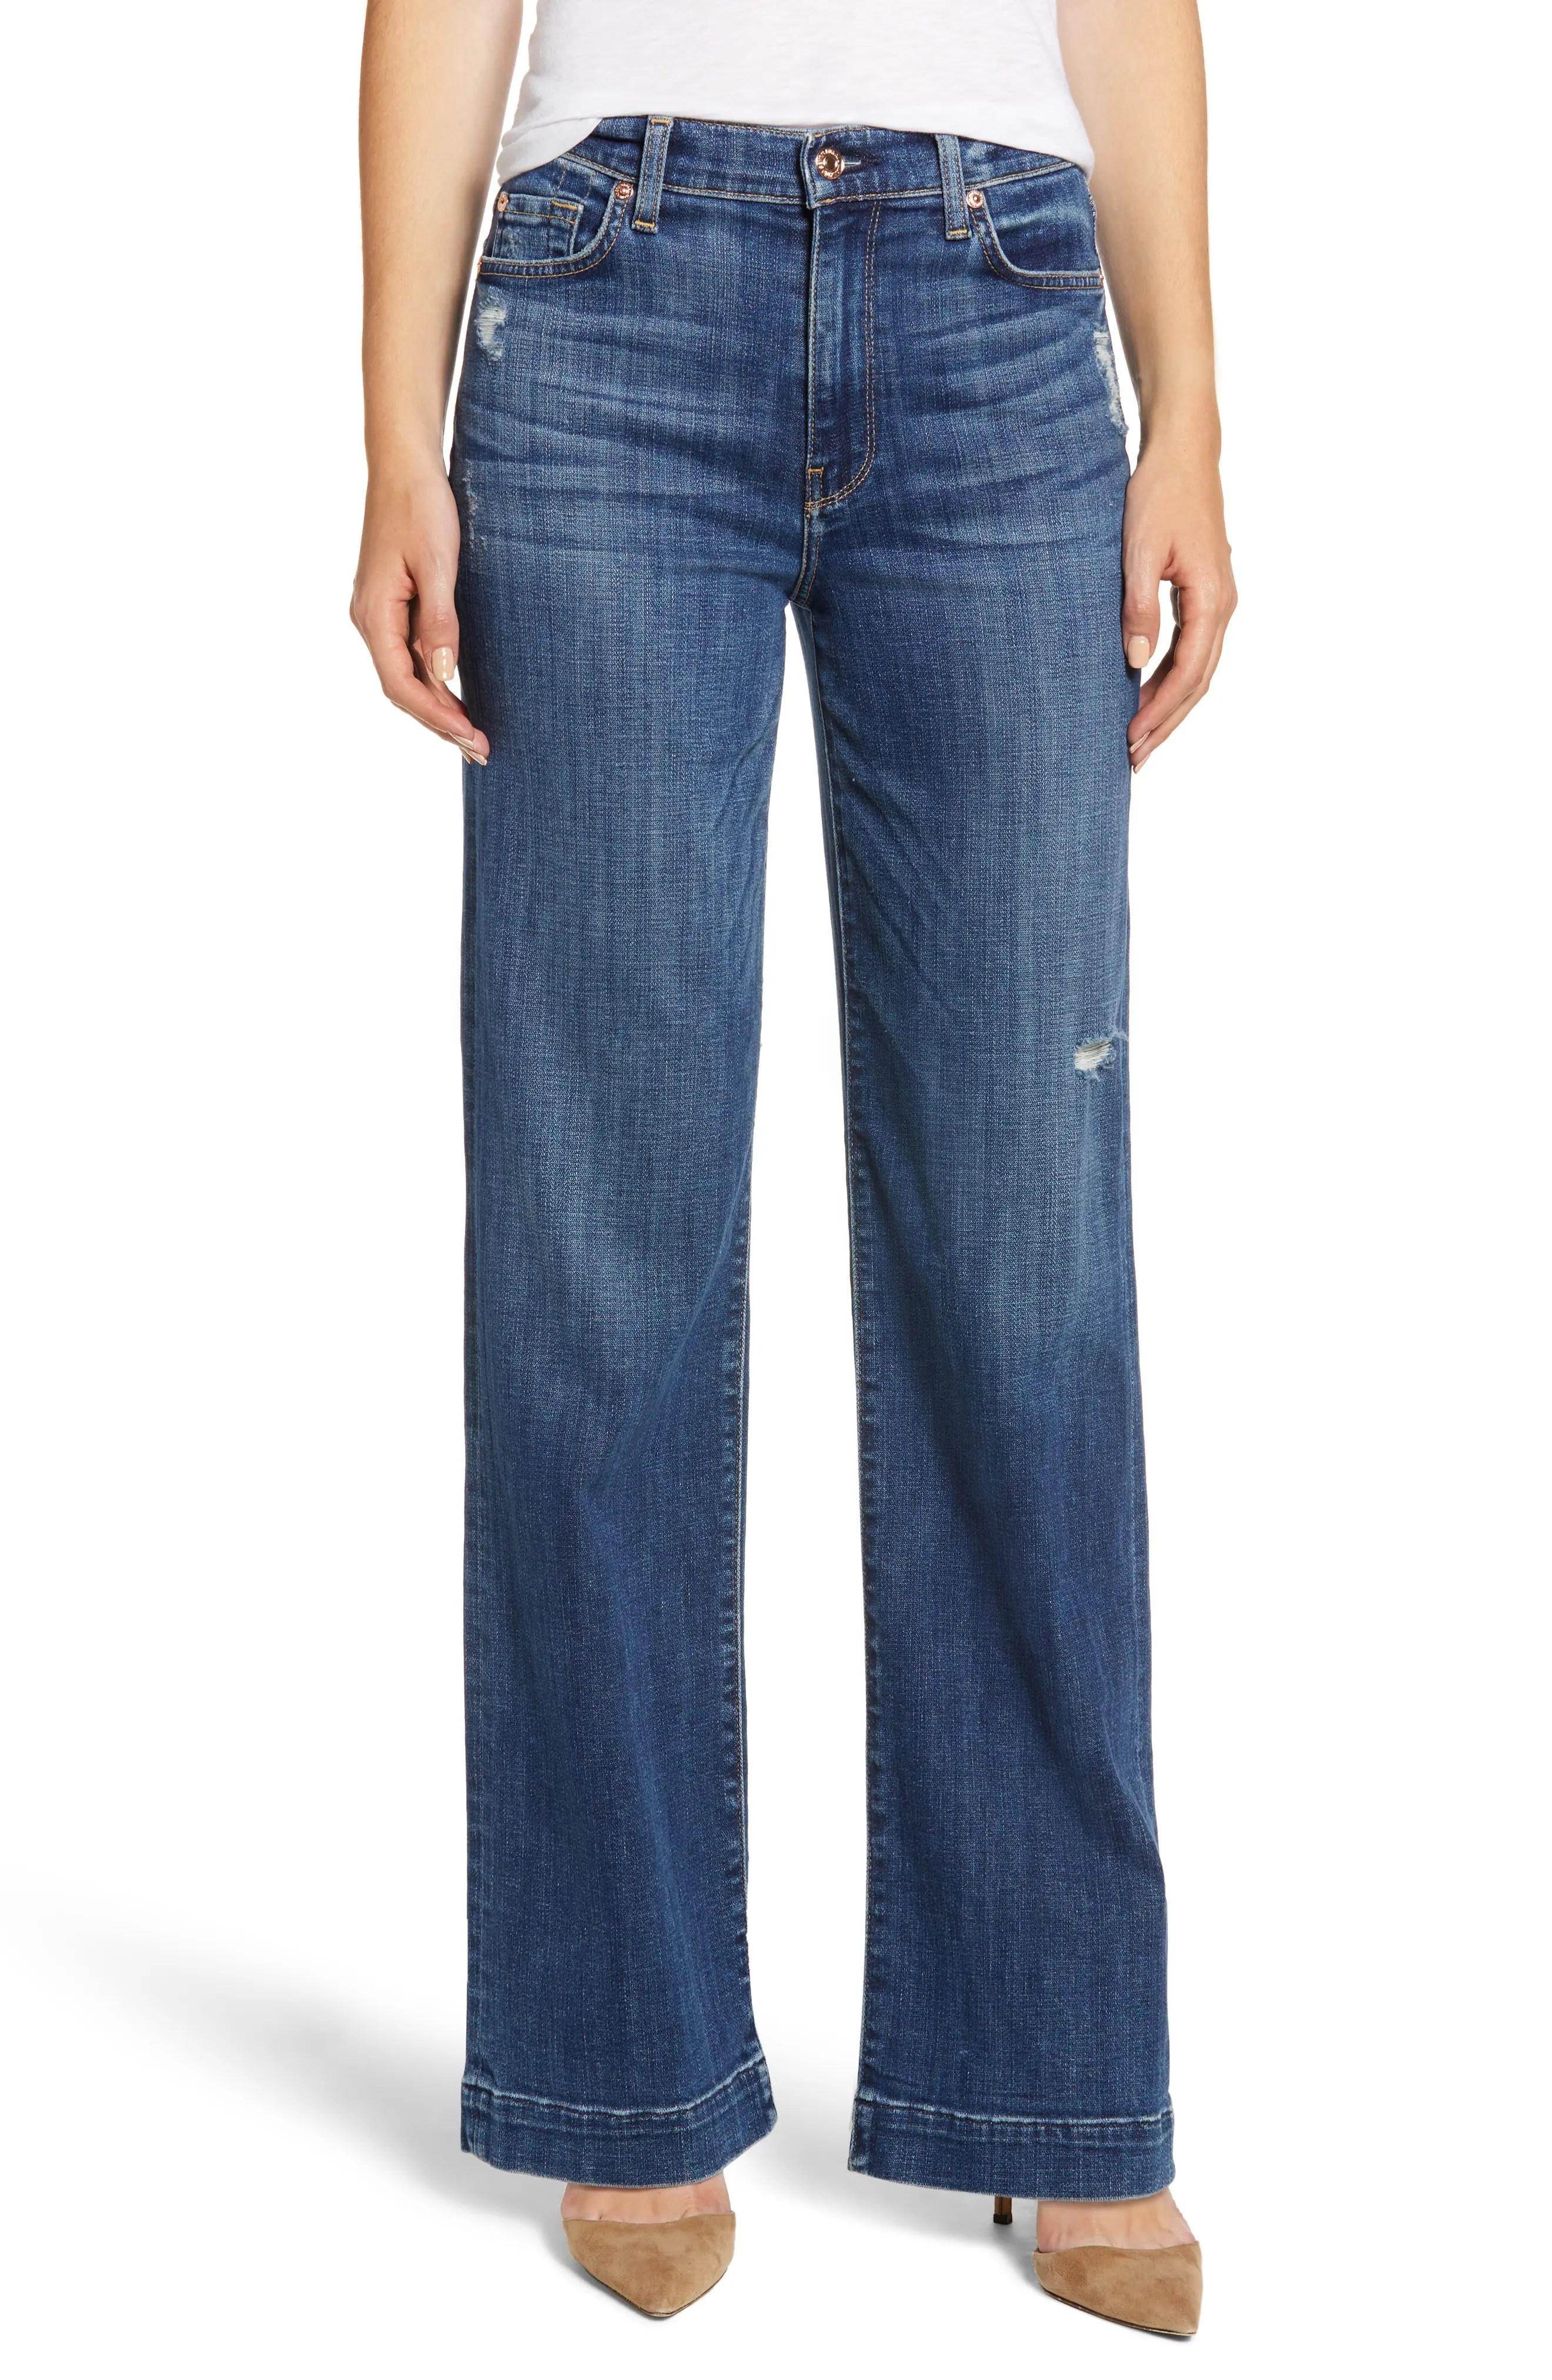 for all mankind alexa wide leg jeans also men   women nordstrom rh shoprdstrom